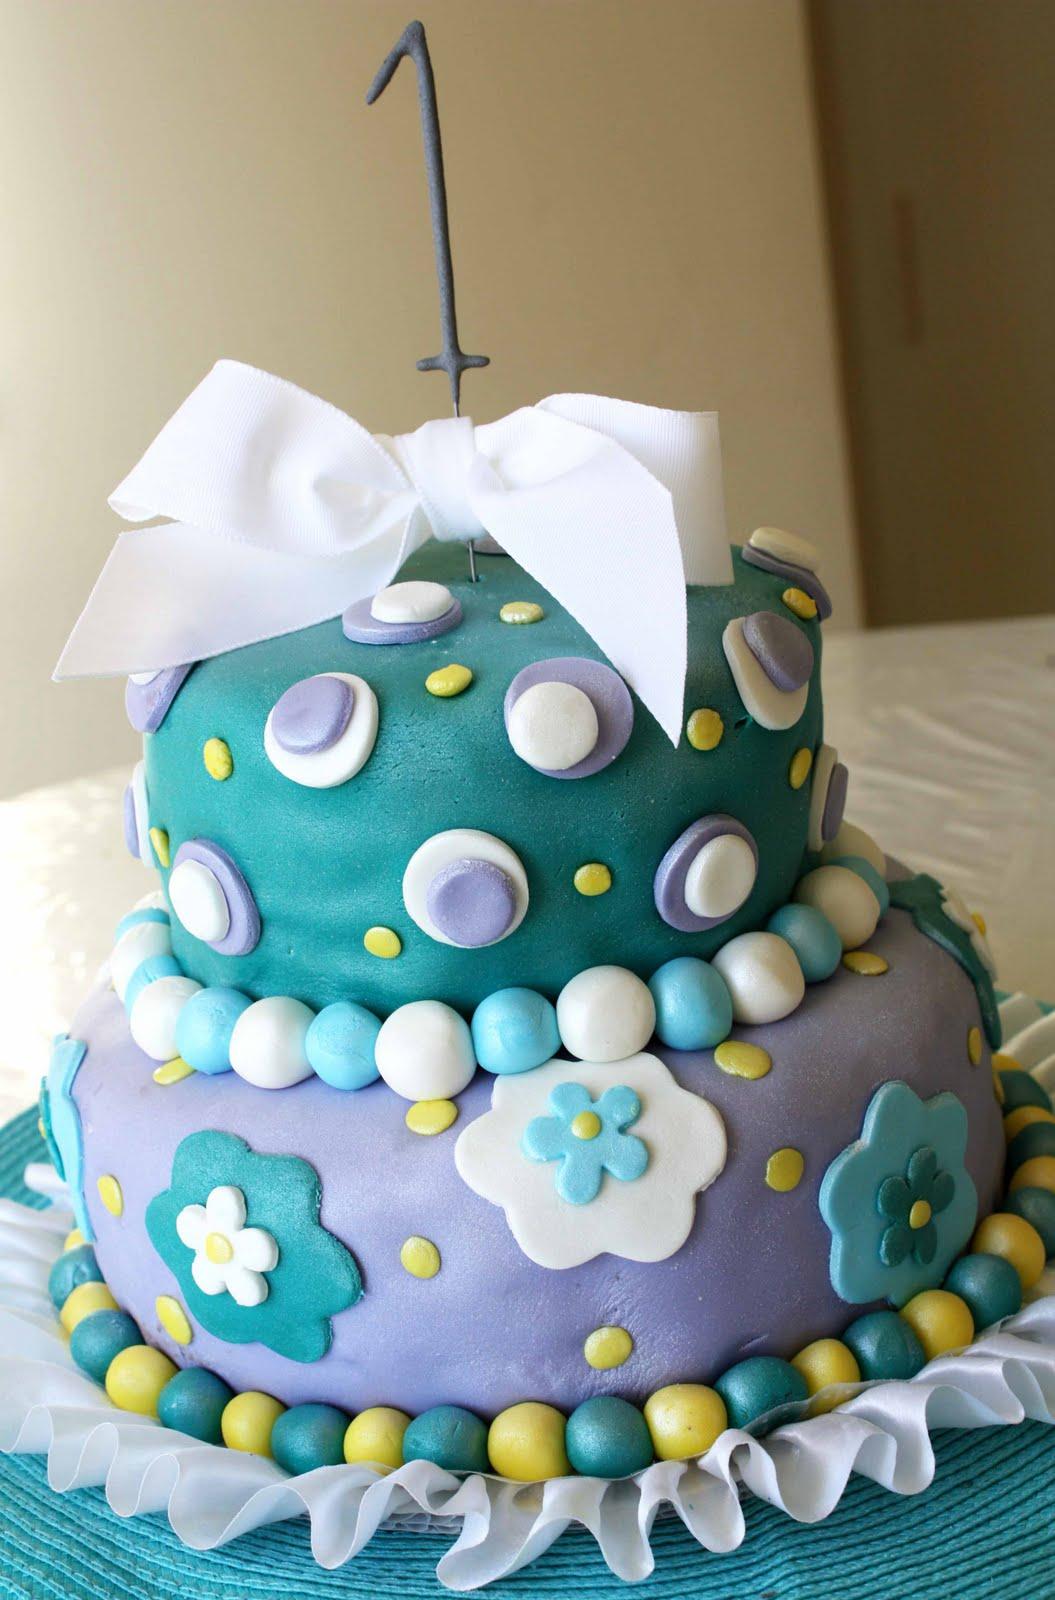 Gourmet Birthday Cakes Prices In Lahore